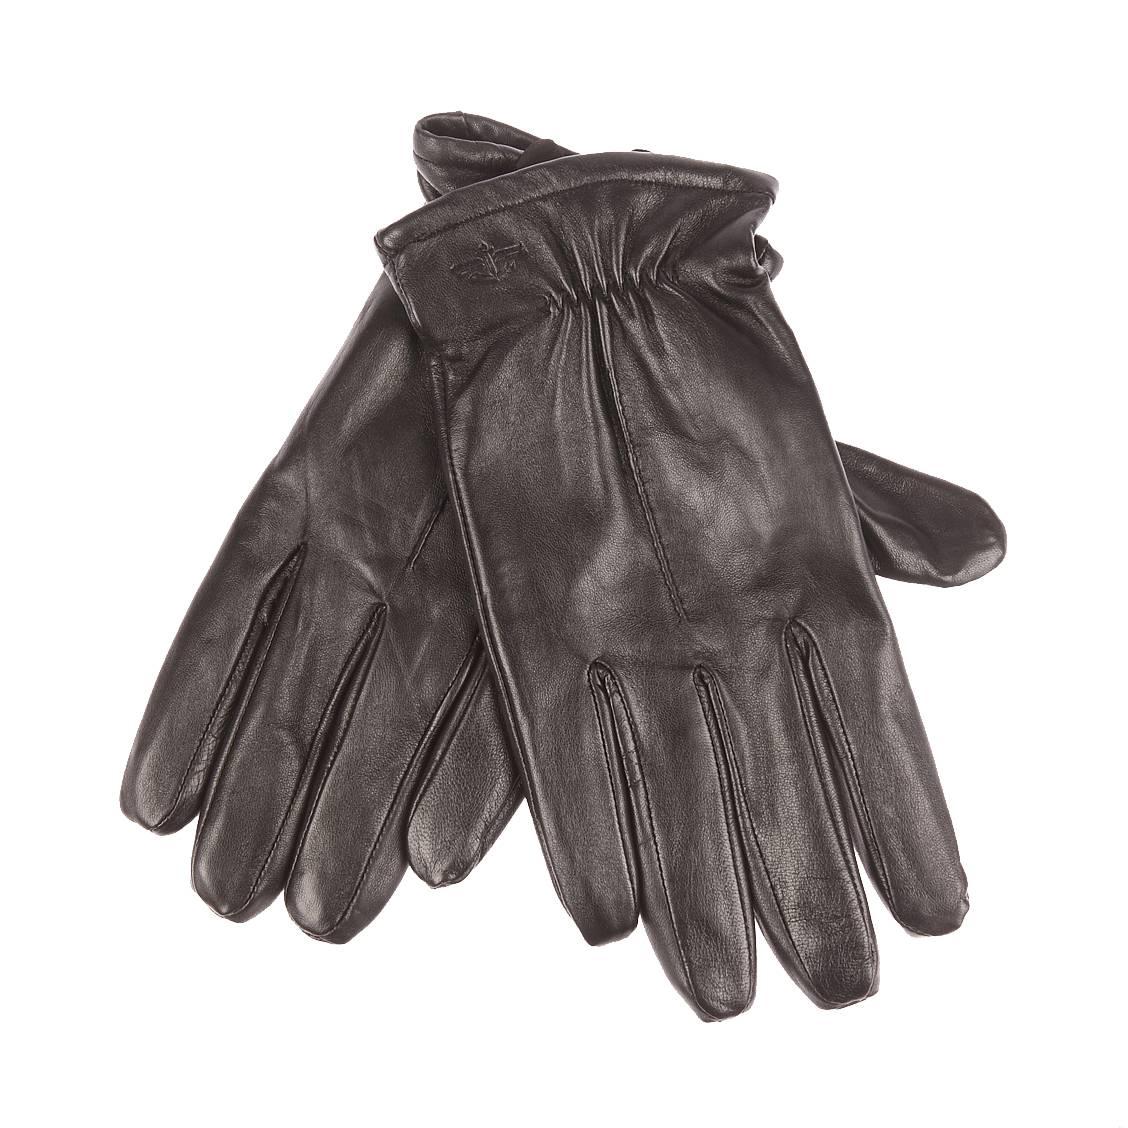 Gants <strong>dockers</strong> en simili cuir noir